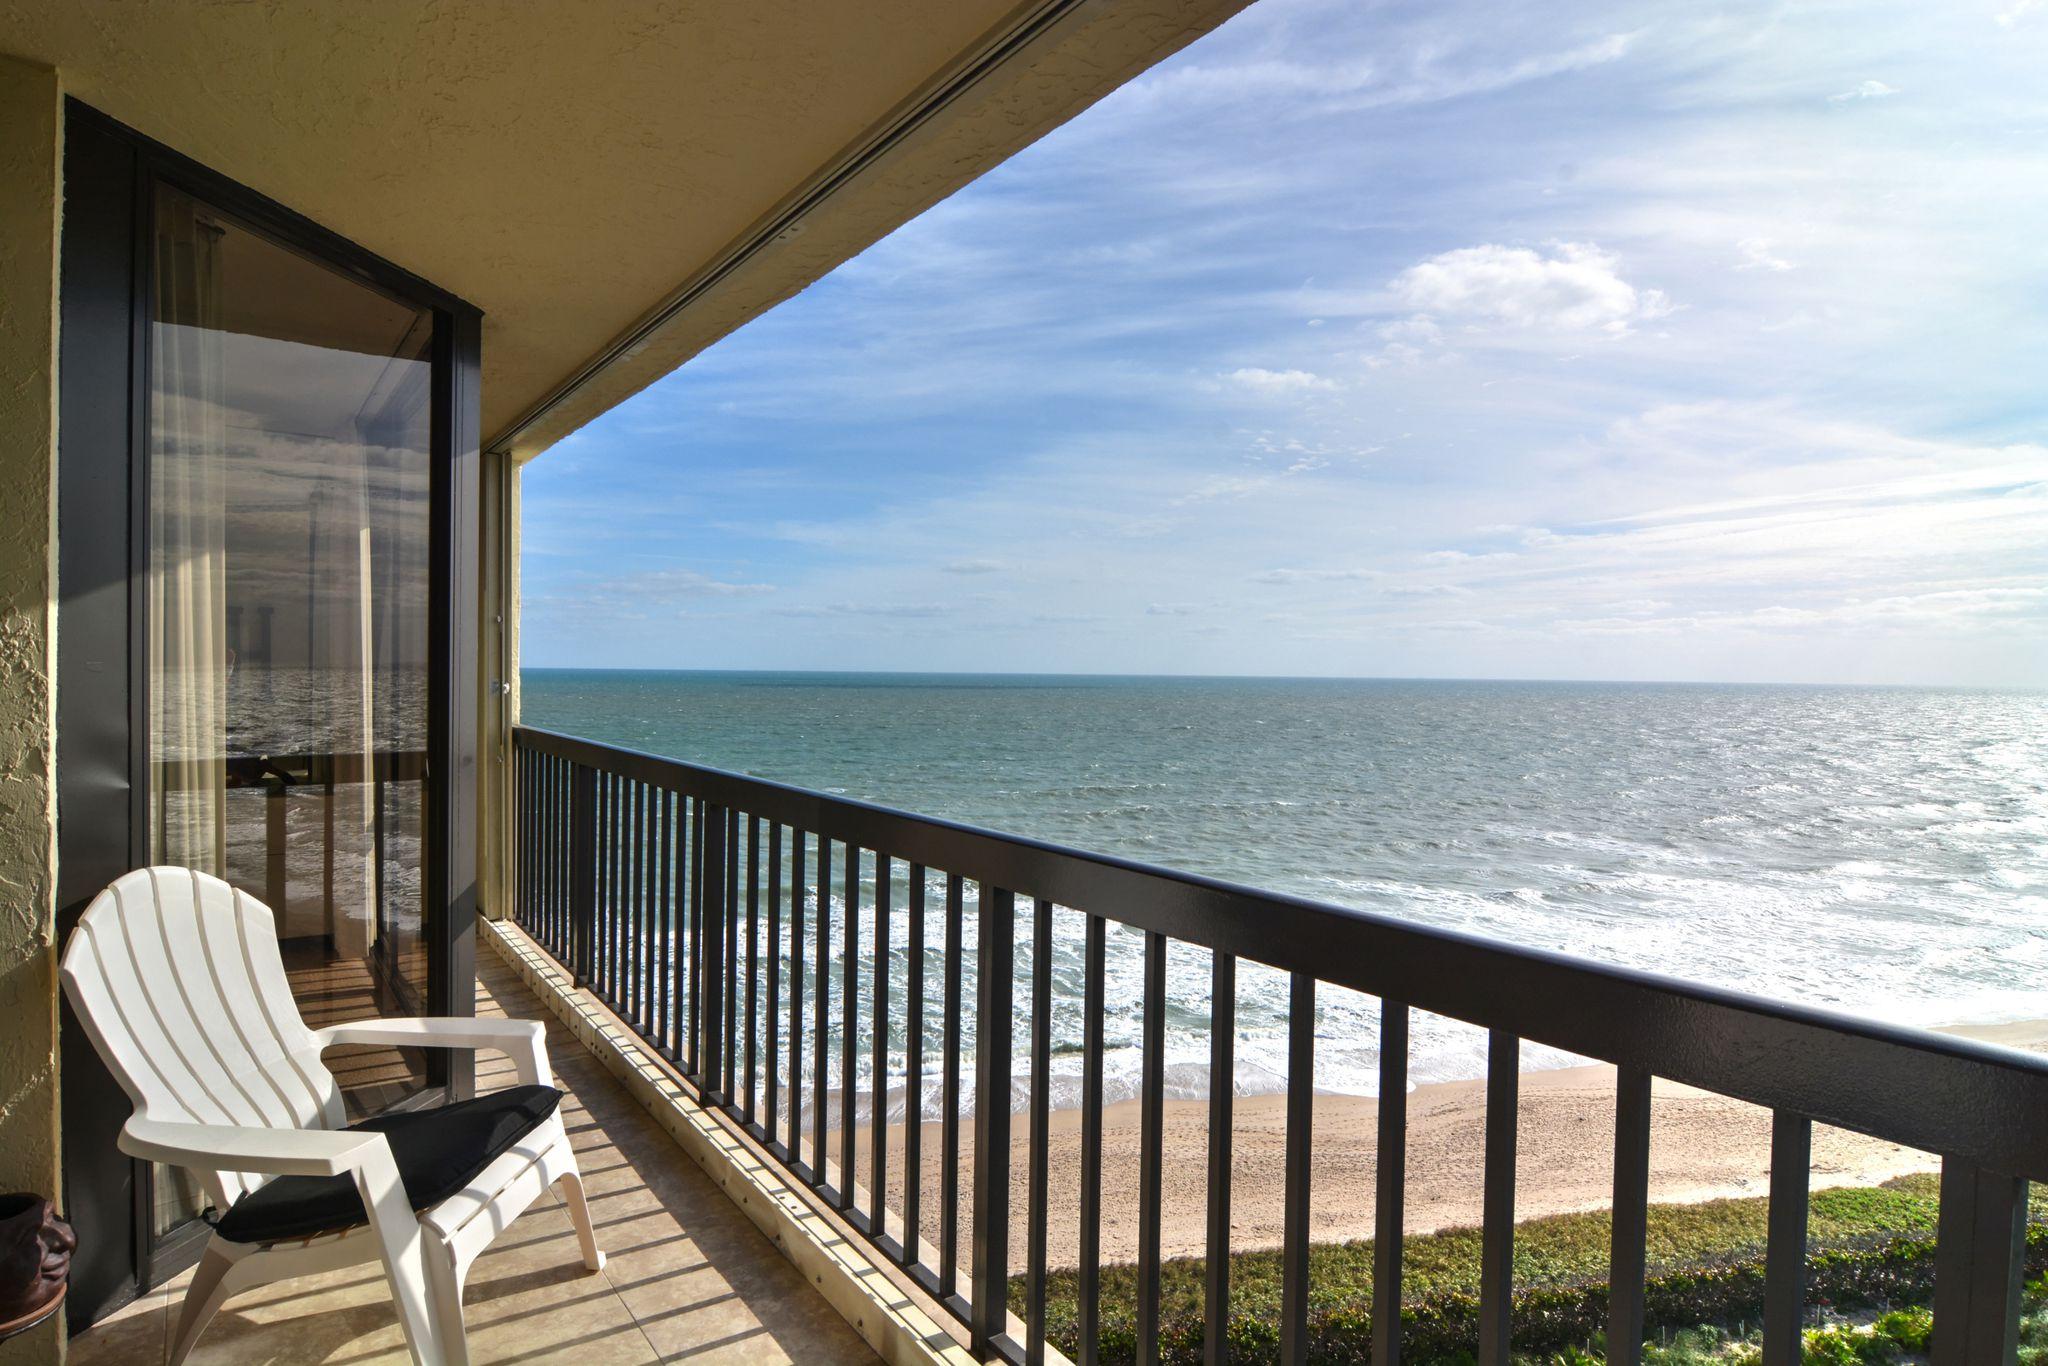 9550 S Ocean Dr 1208 Jensen Beach Fl 34957 2 Bed 2 Bath